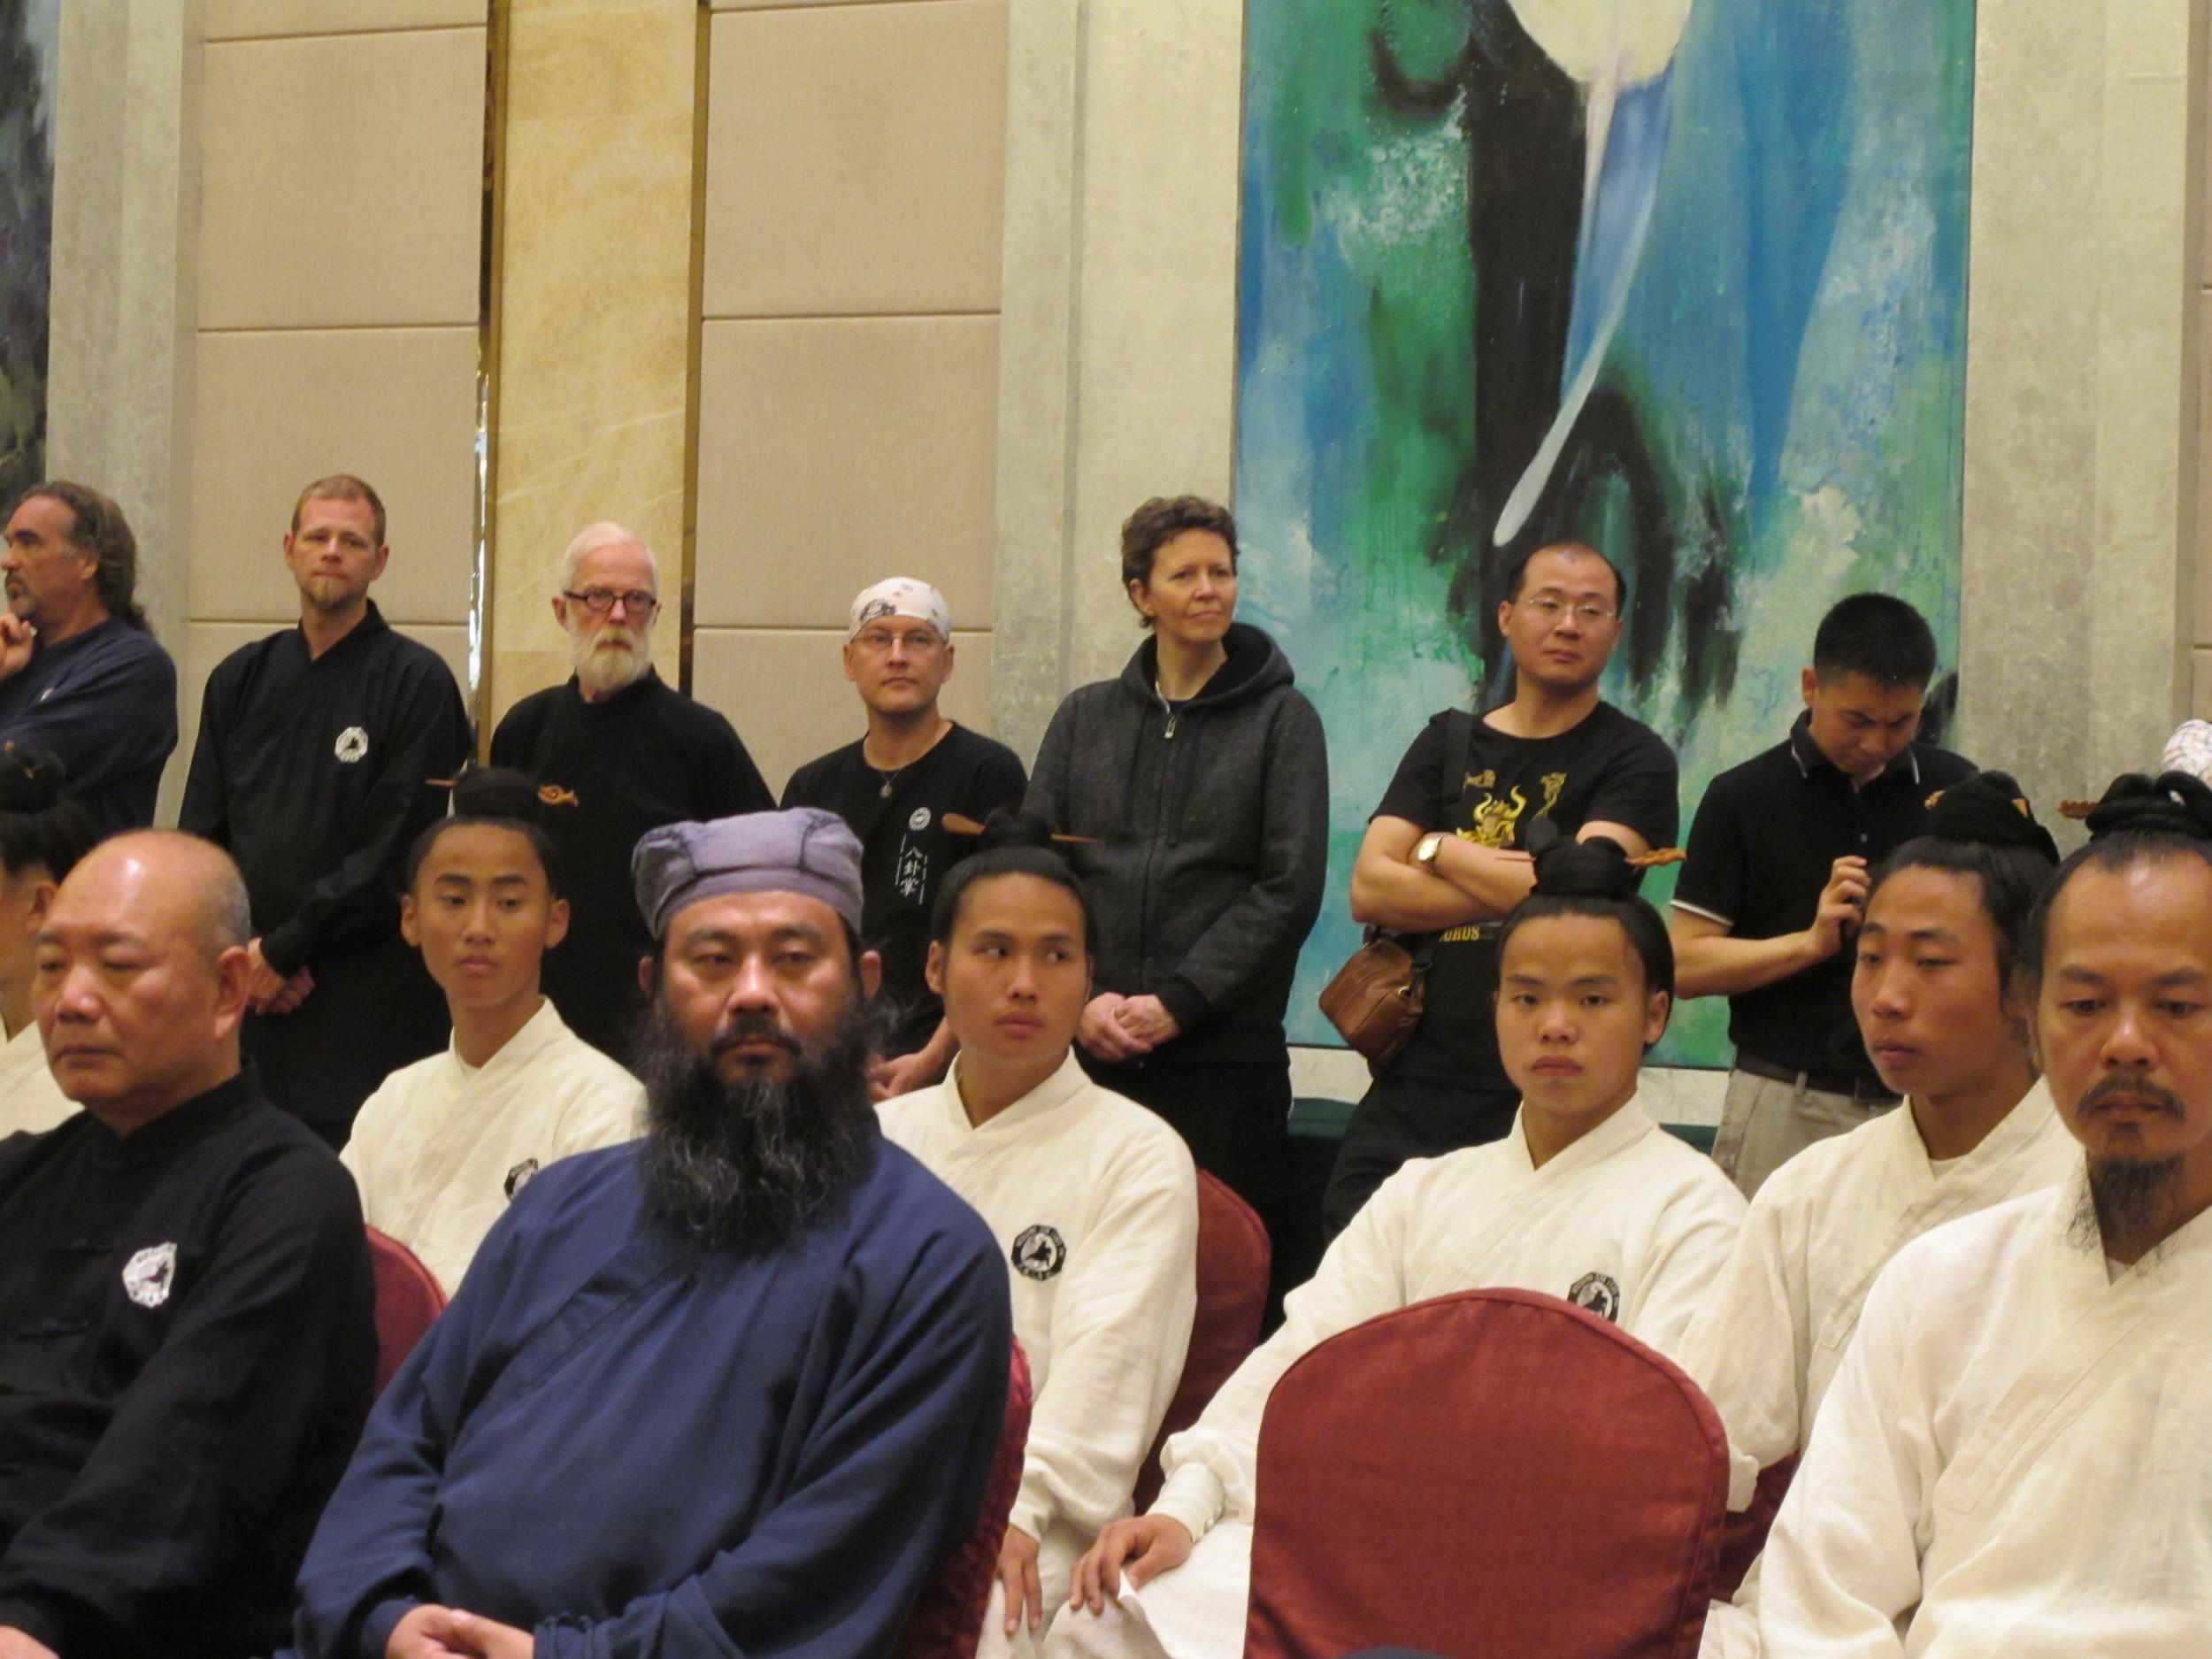 Grand Master Zhong's had new disciples today